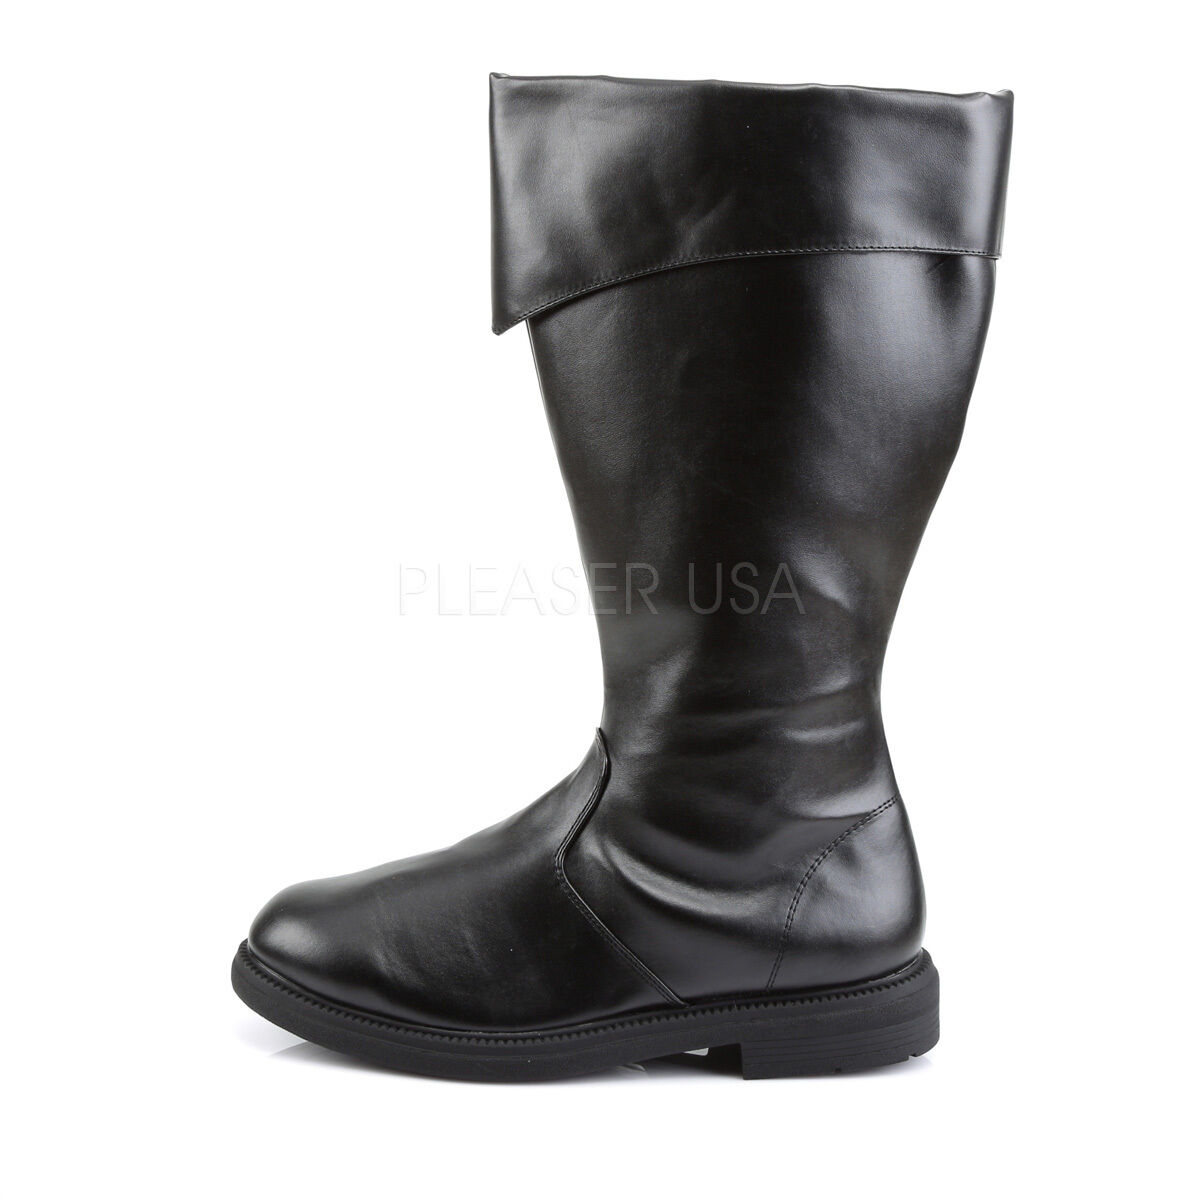 Funtasma Captain Vegi Knee High Costume Pirate Vader Cosplay Boots Mens 8-14